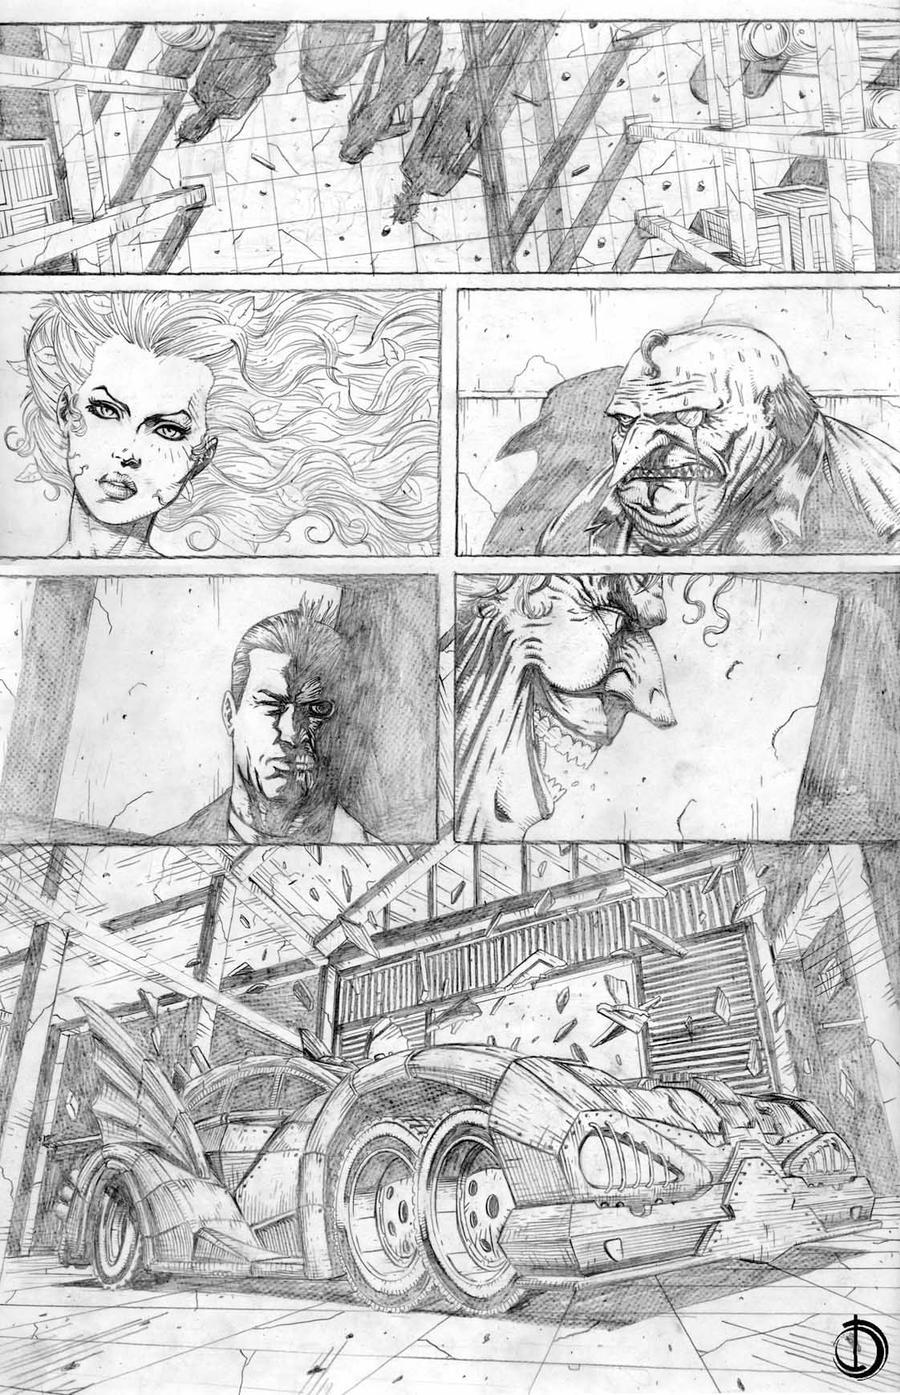 batman page 4 by santiagocomics